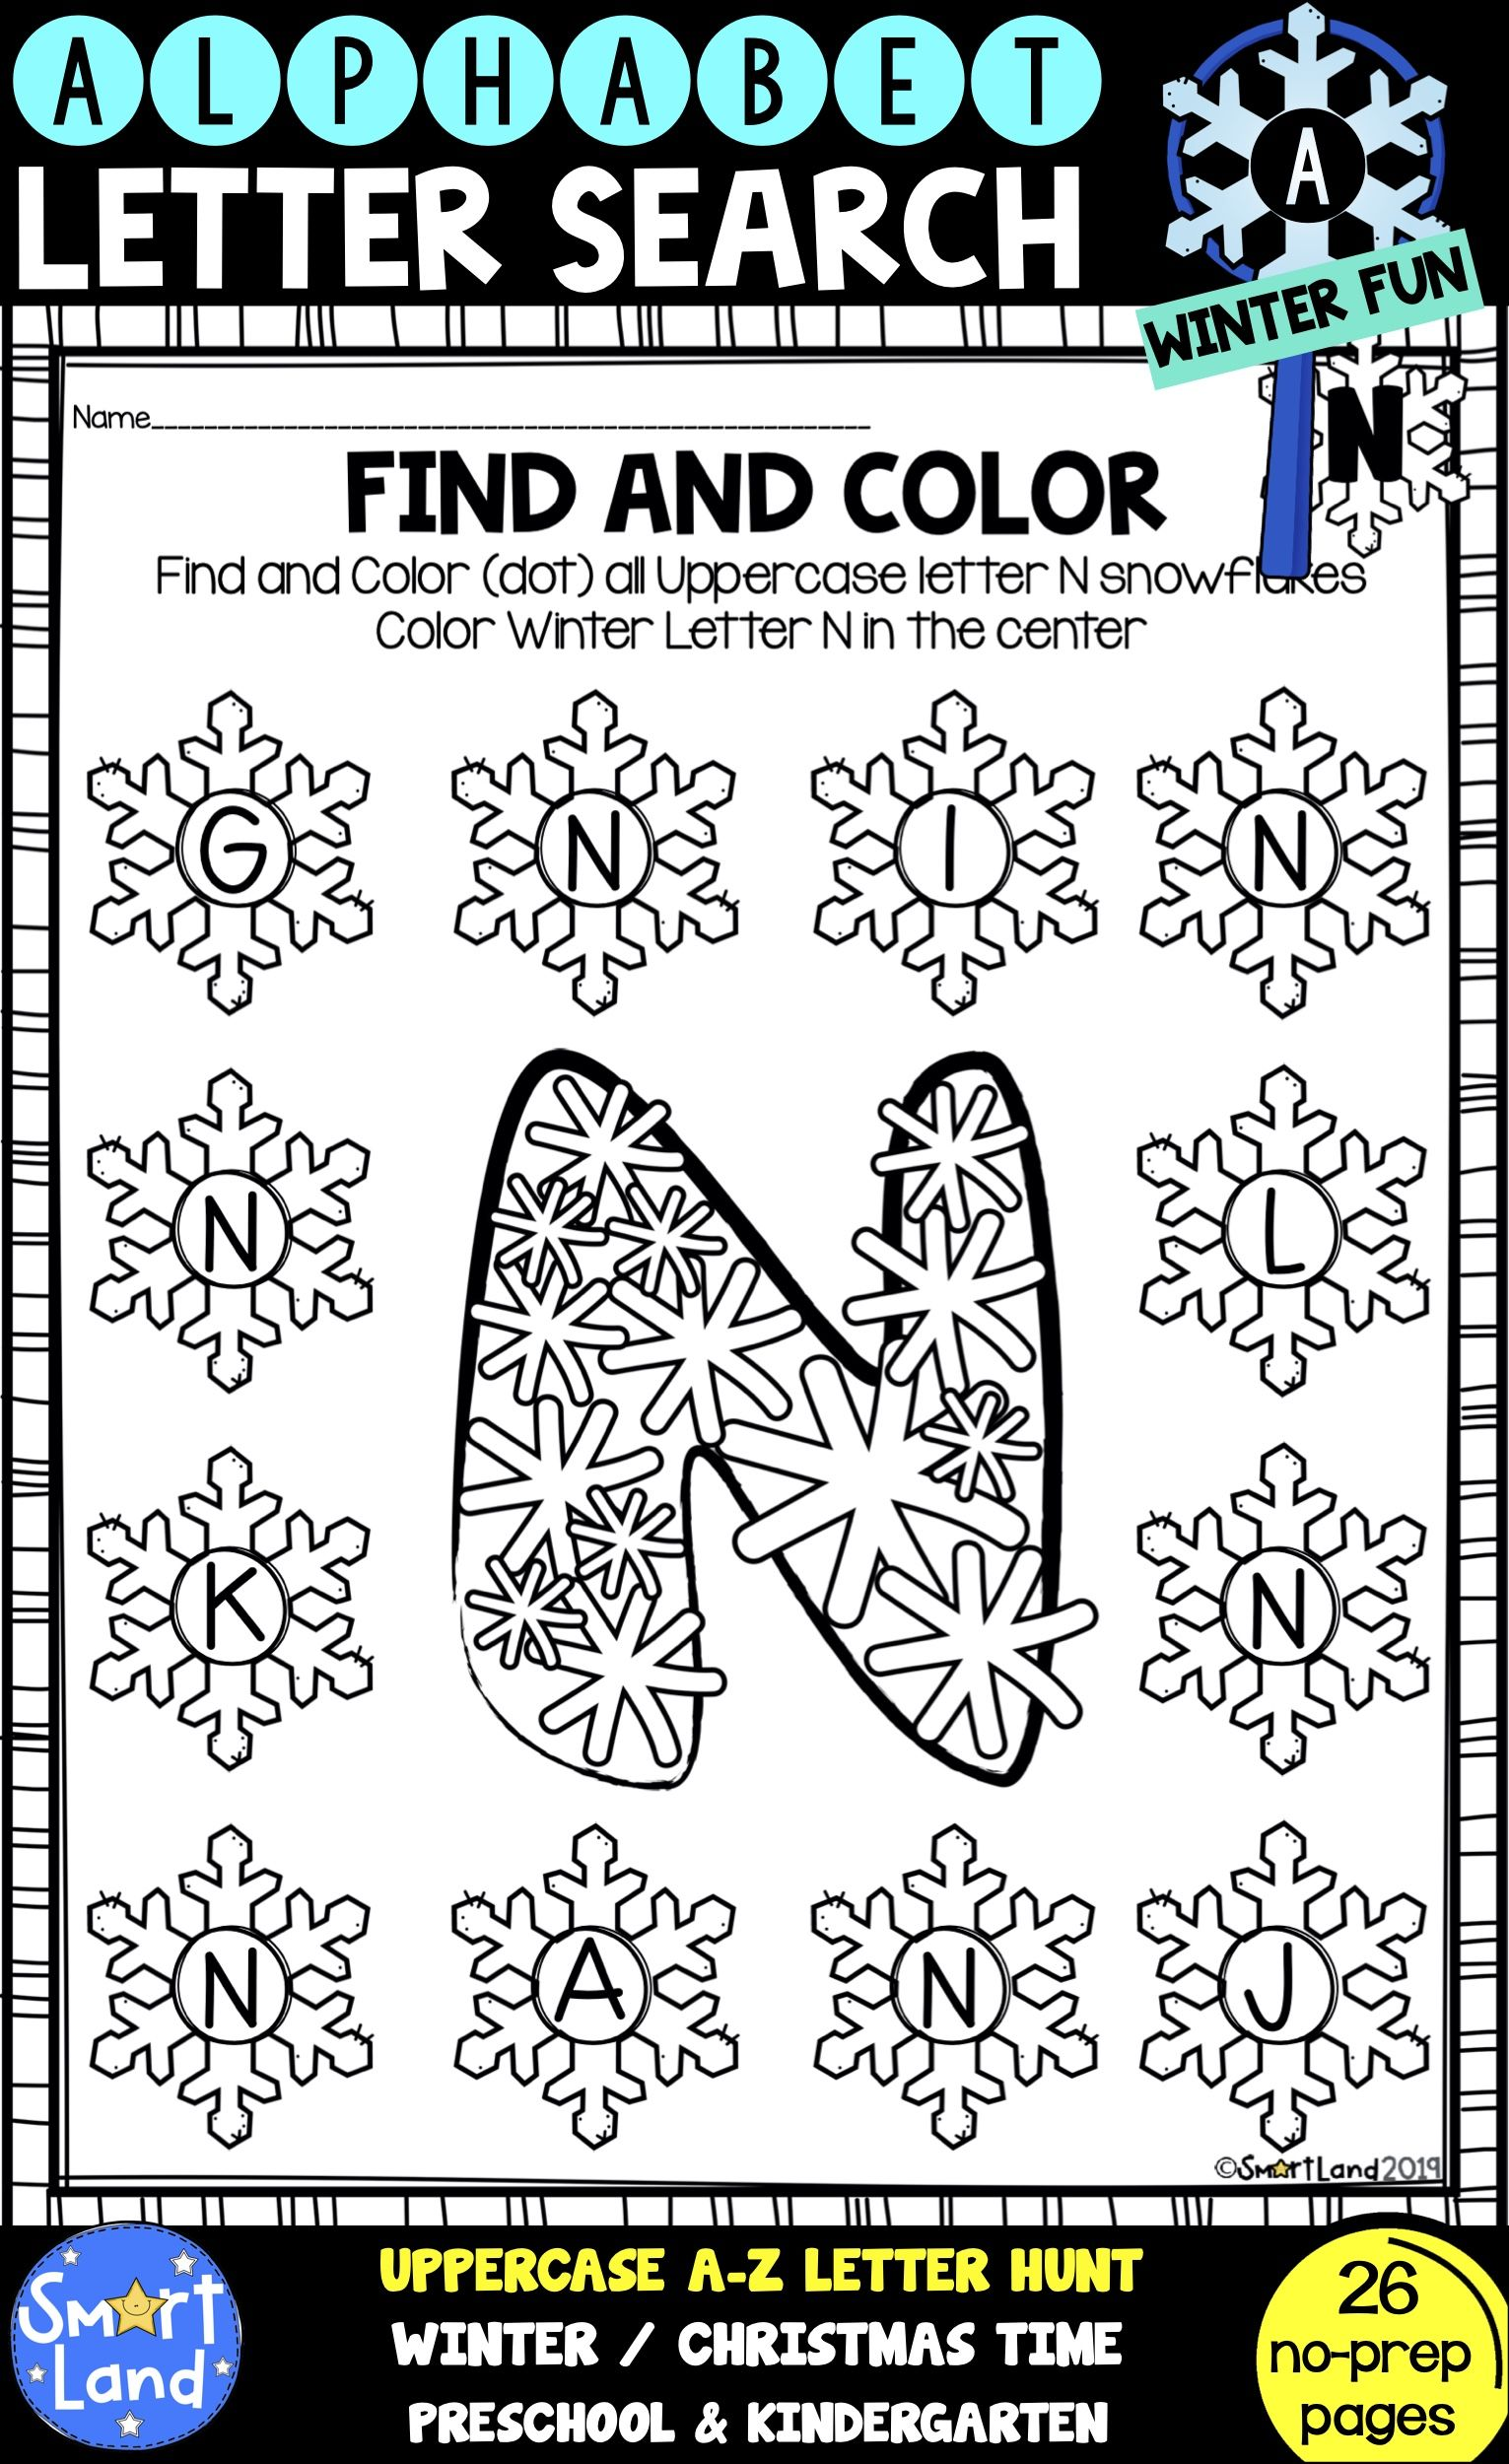 Alphabet Practice Letter Search Snowflake